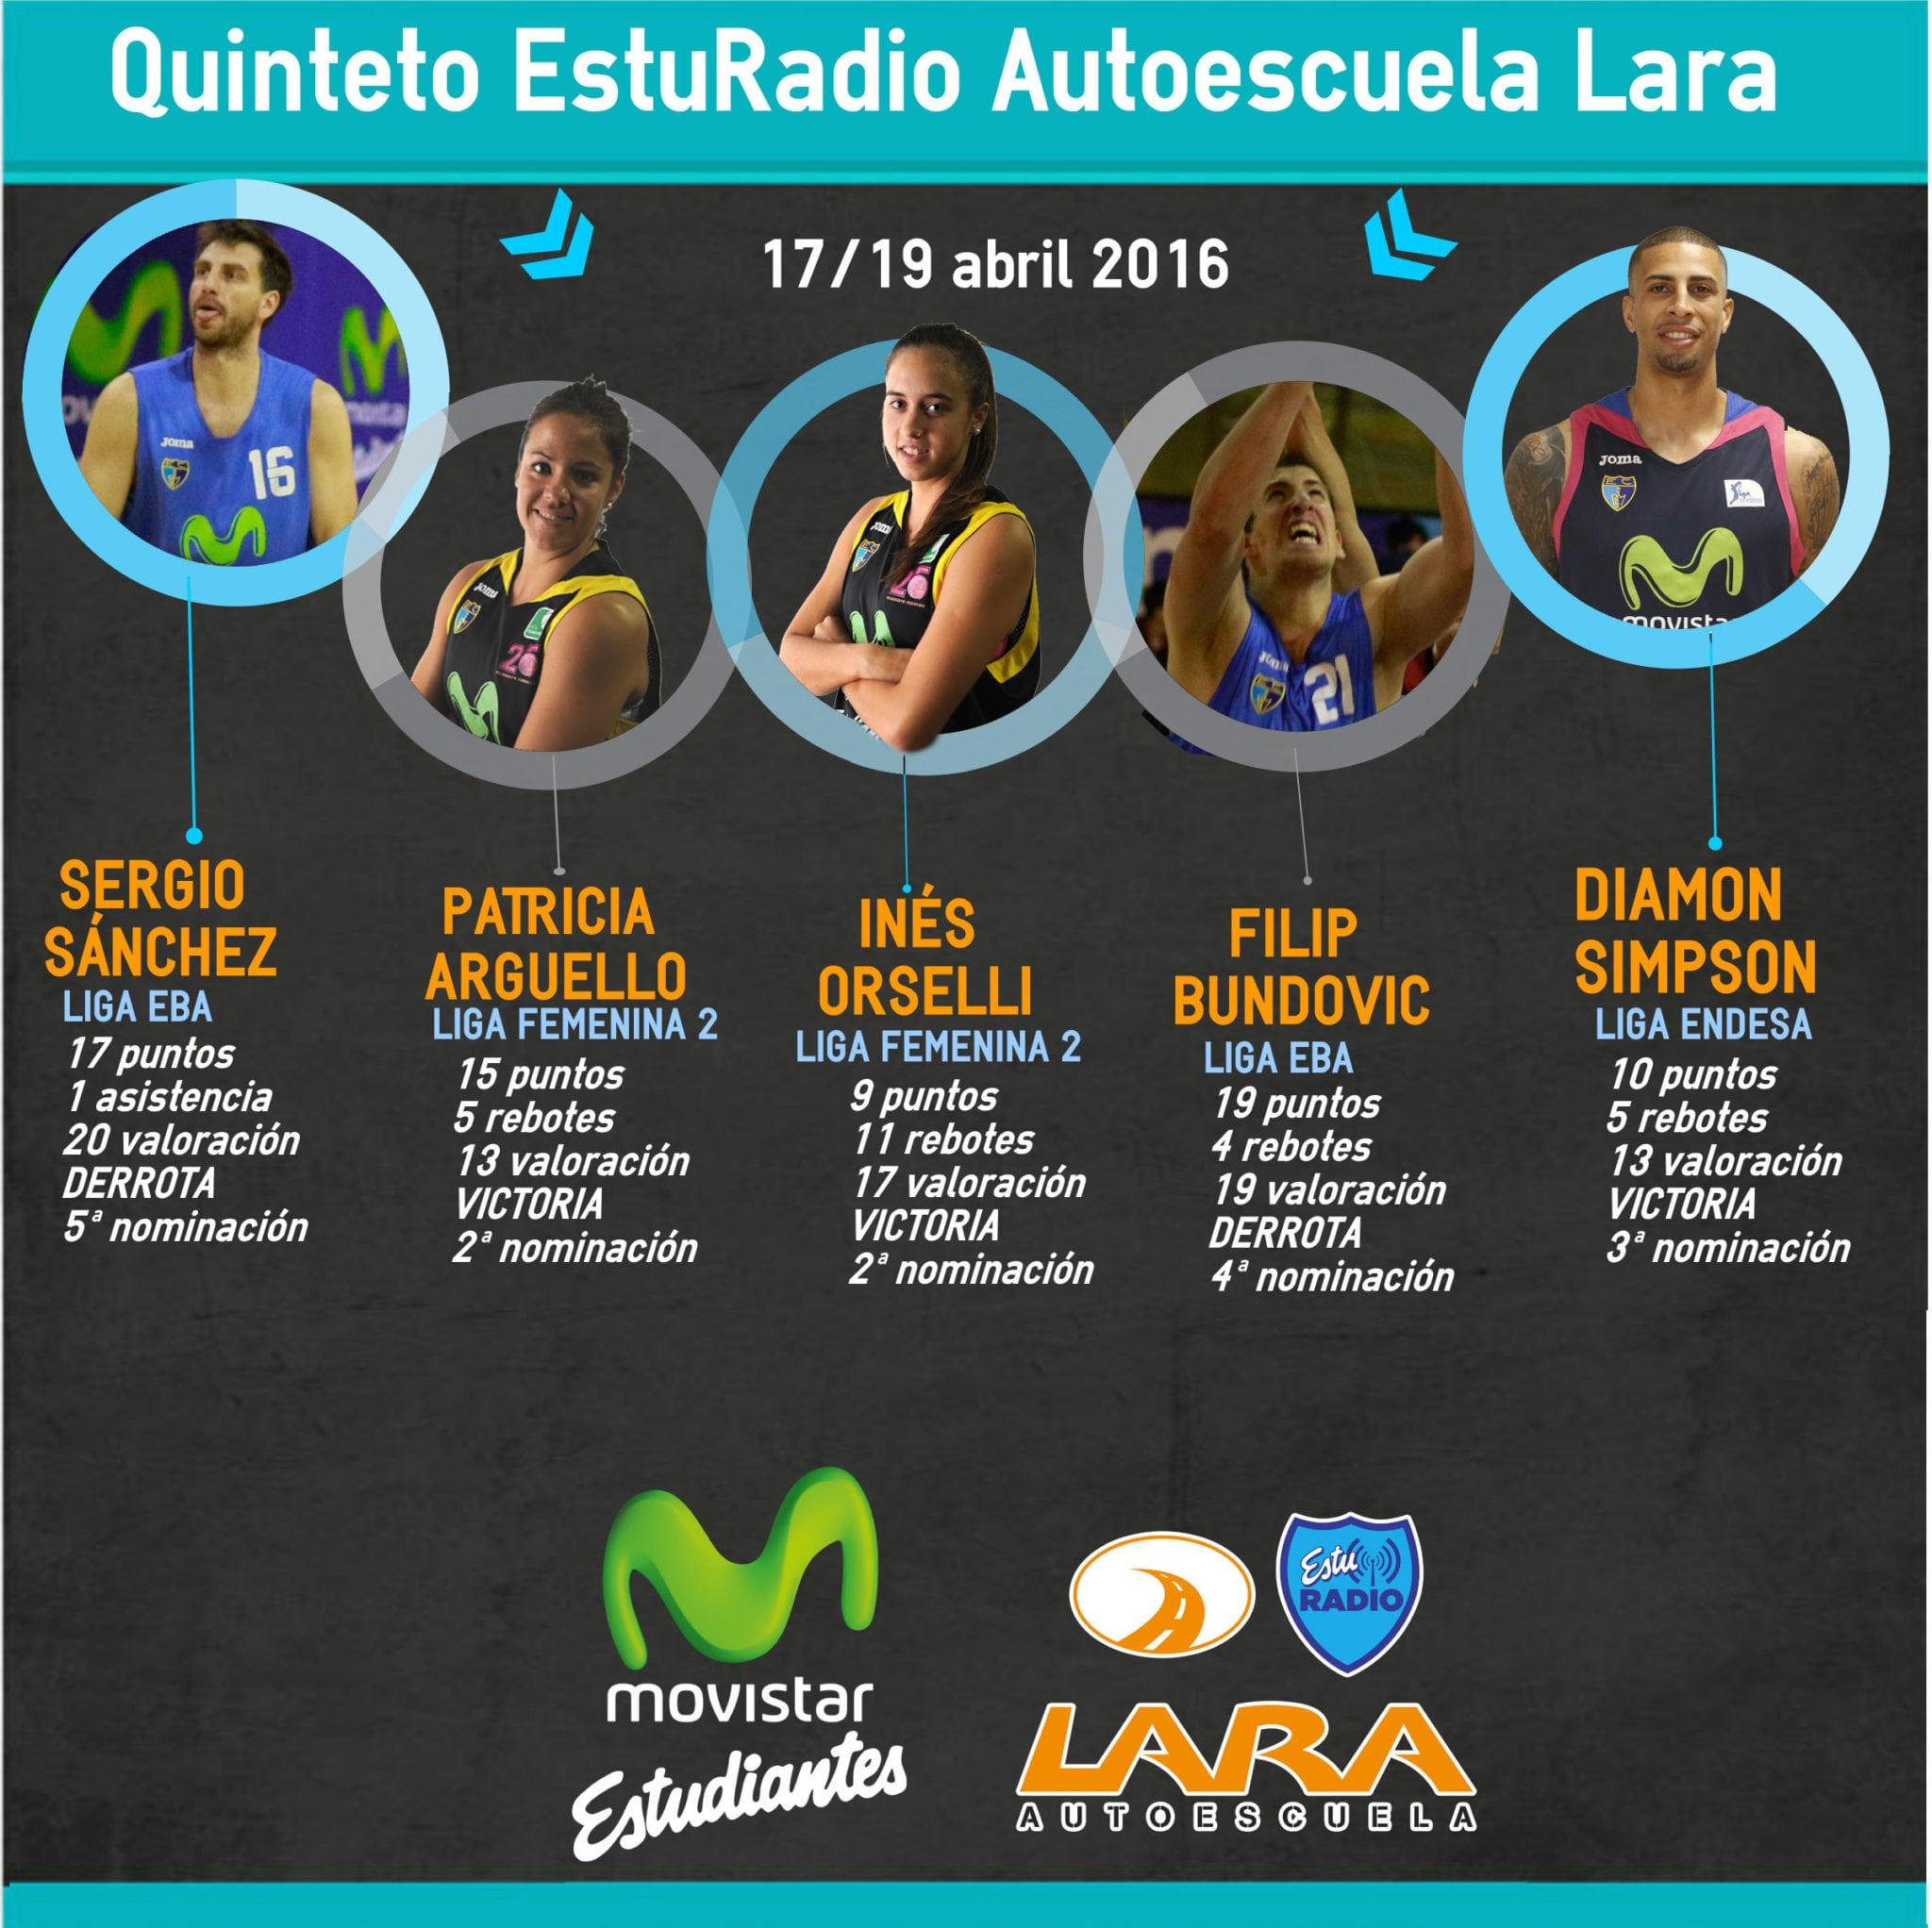 Quinteto EstuRadio Autoescuela Lara: Sergio Sánchez, Patricia Argüello, Inés Orselli, Filip Bundovic y Diamon Simpson